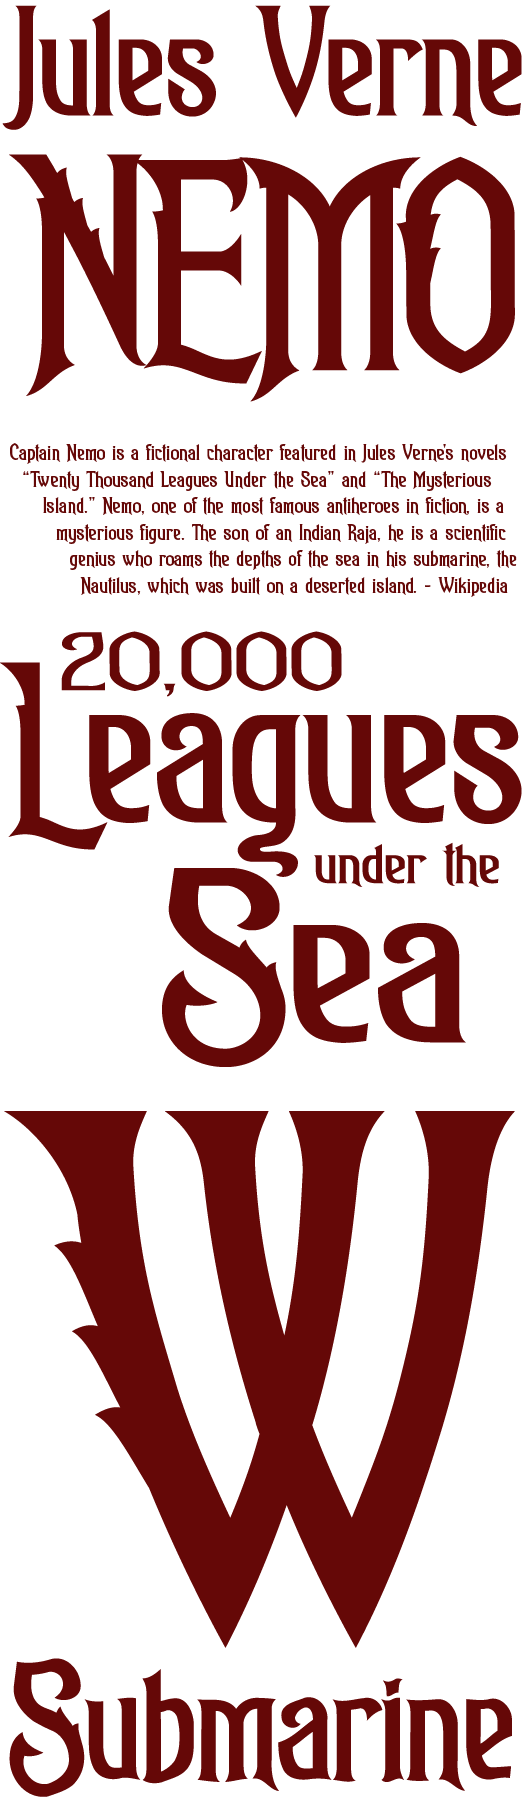 Nautical Font Styles Nautilus font